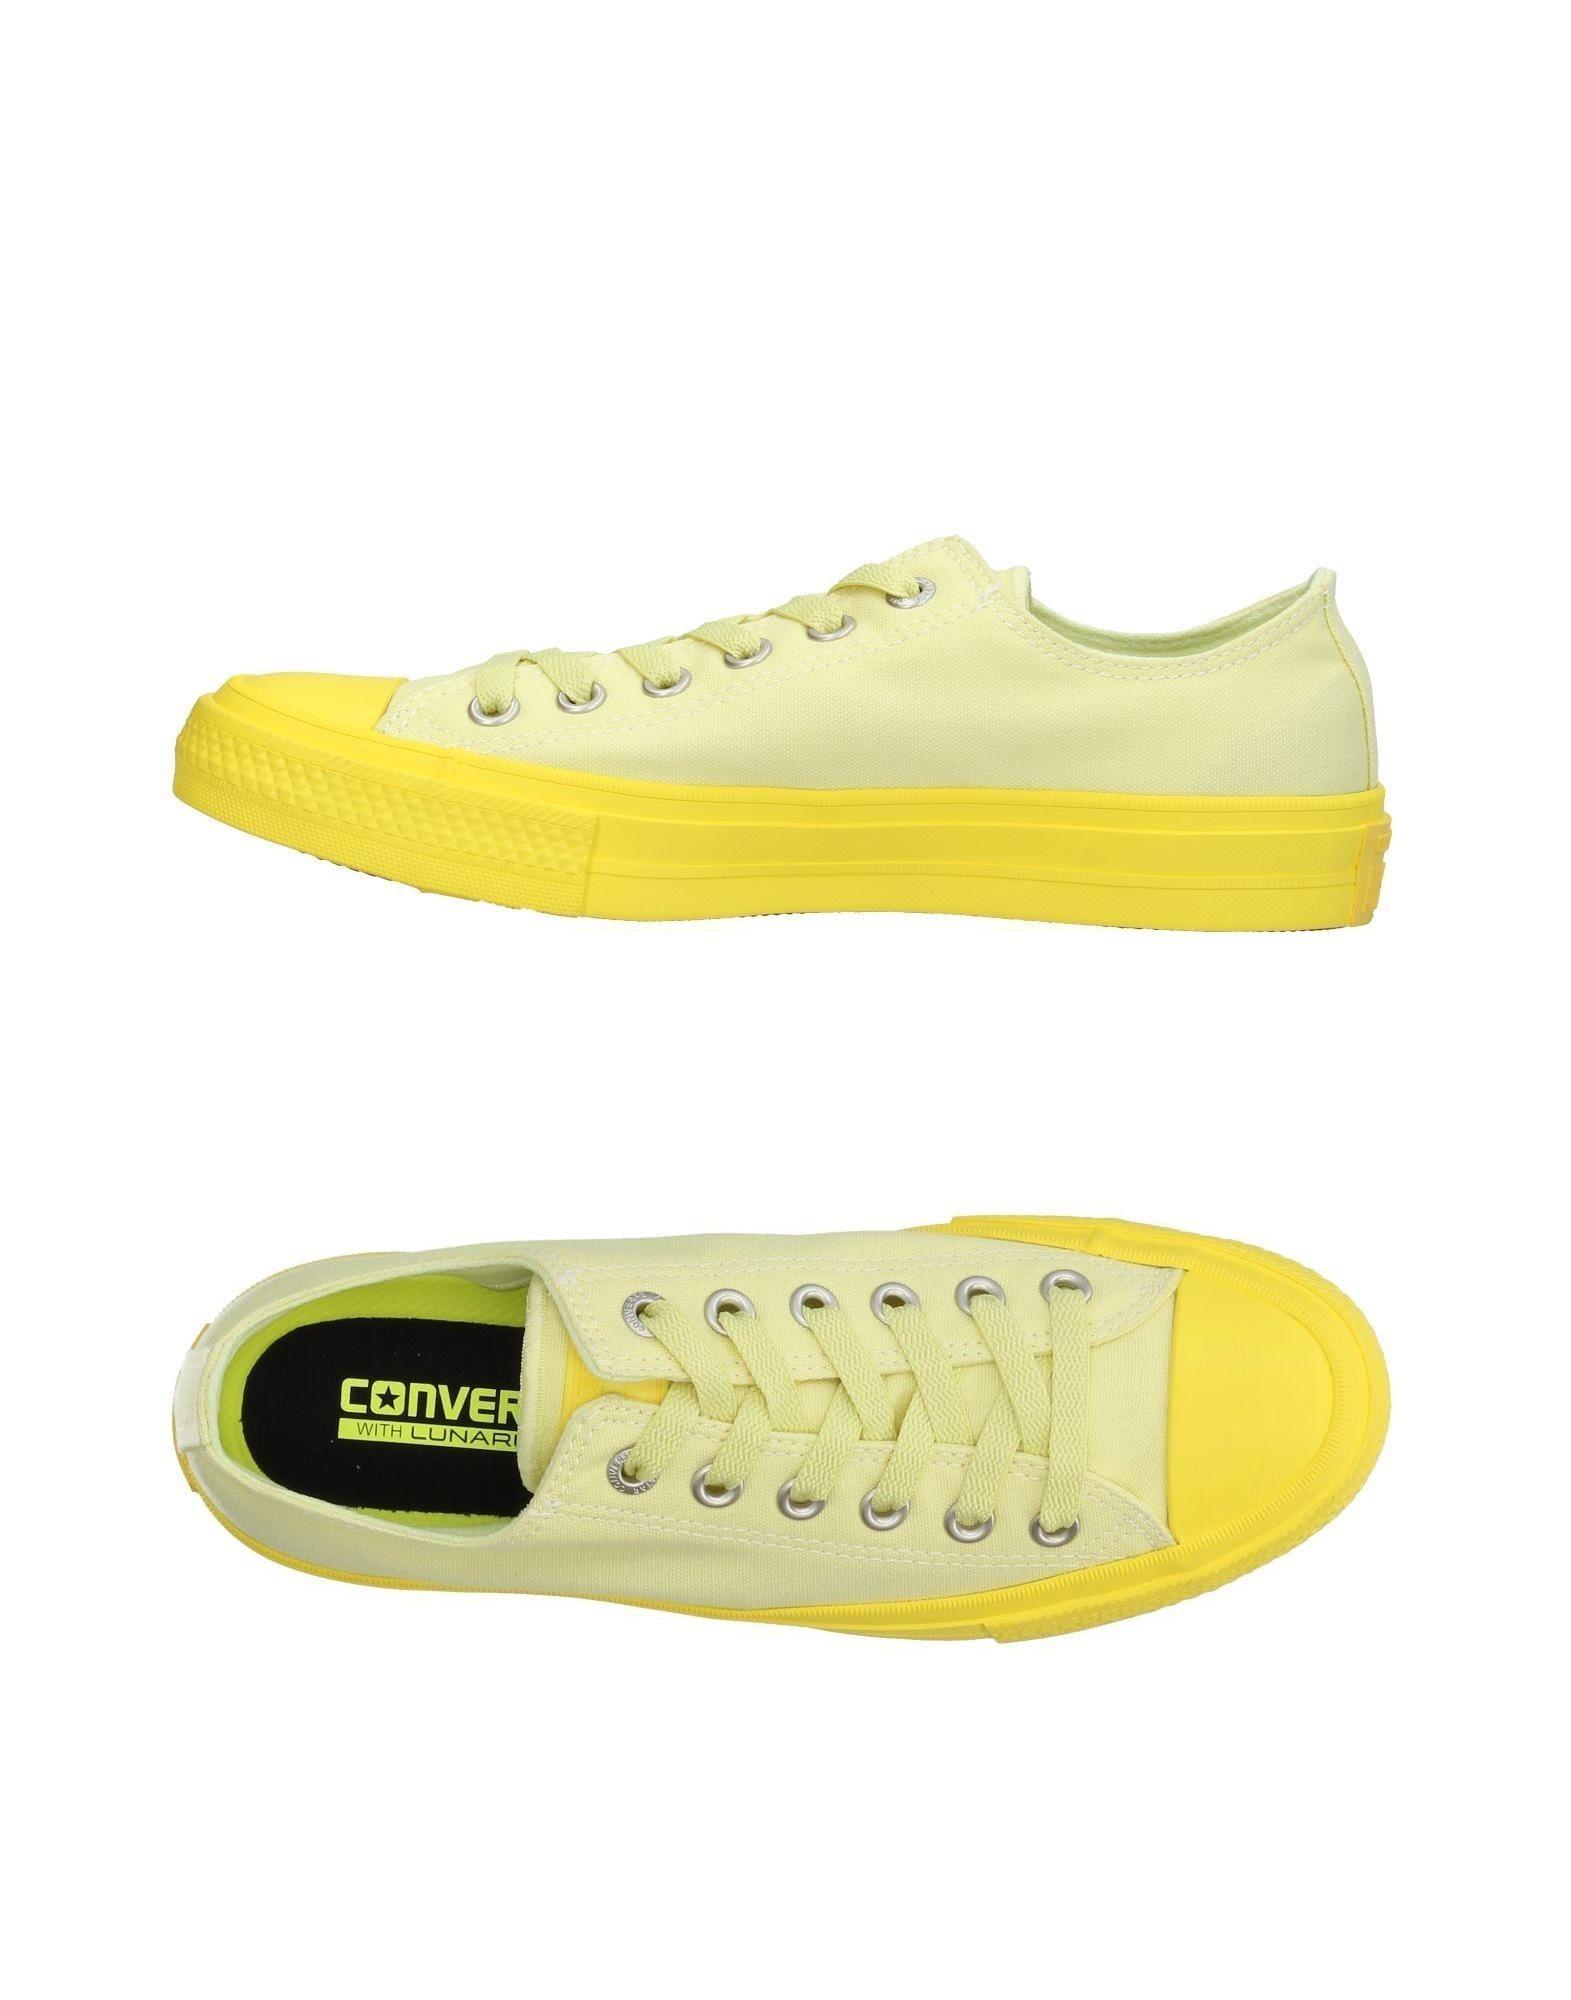 c8d16ffd1b22 Converse All Star Chuck Taylor Ii Sneakers - Women Converse All Star Chuck  Taylor Ii Sneakers online on YOOX United States - 11401588WW